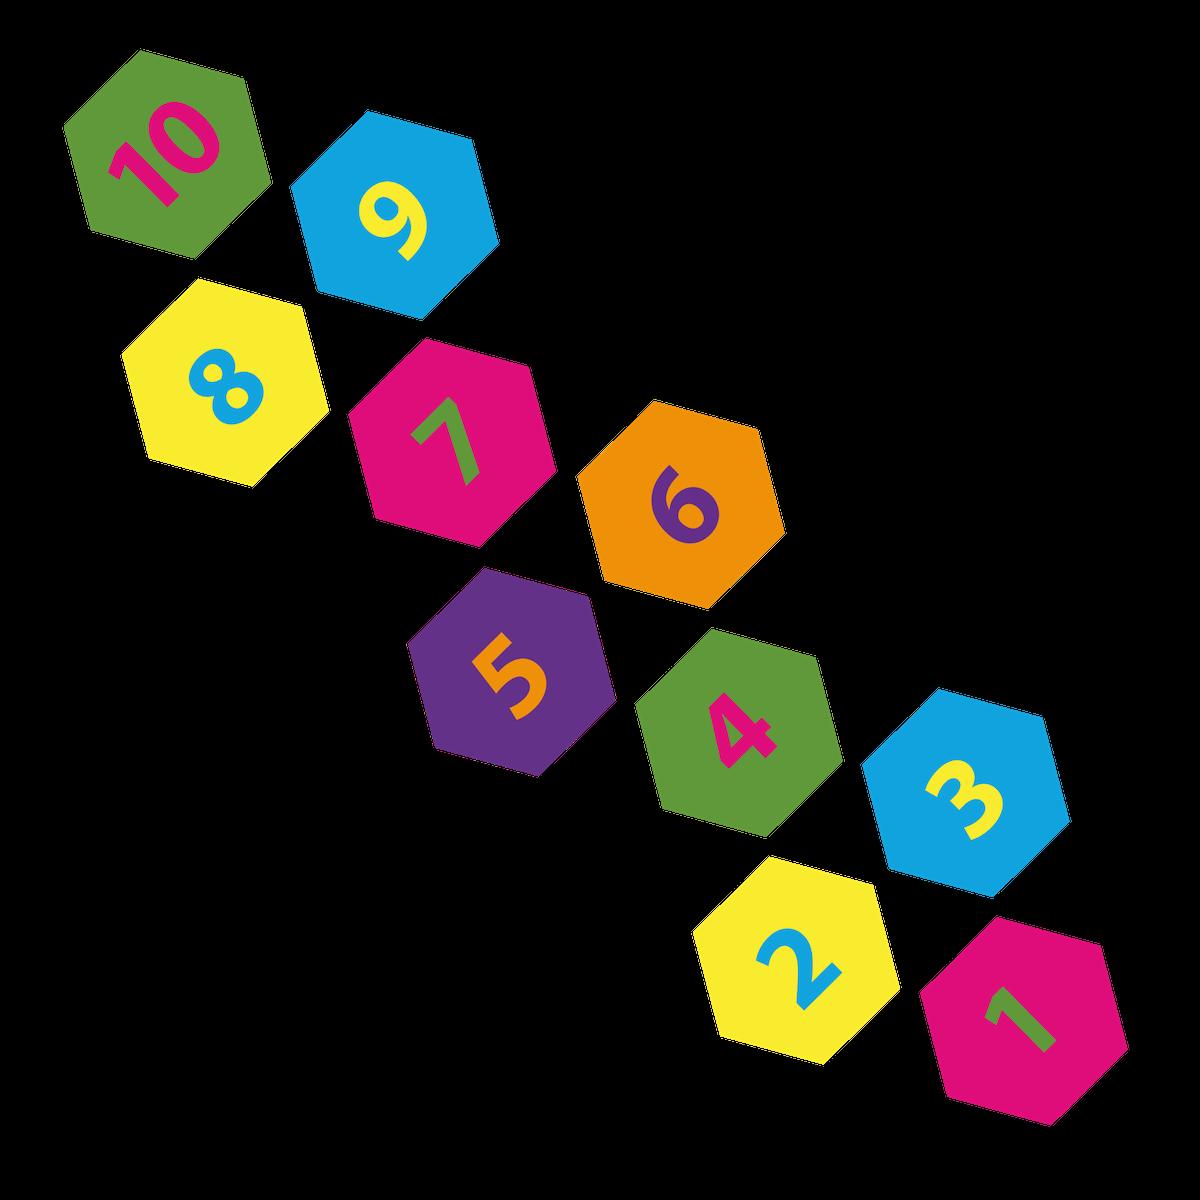 Playground Marking Hexagon Hopscotch